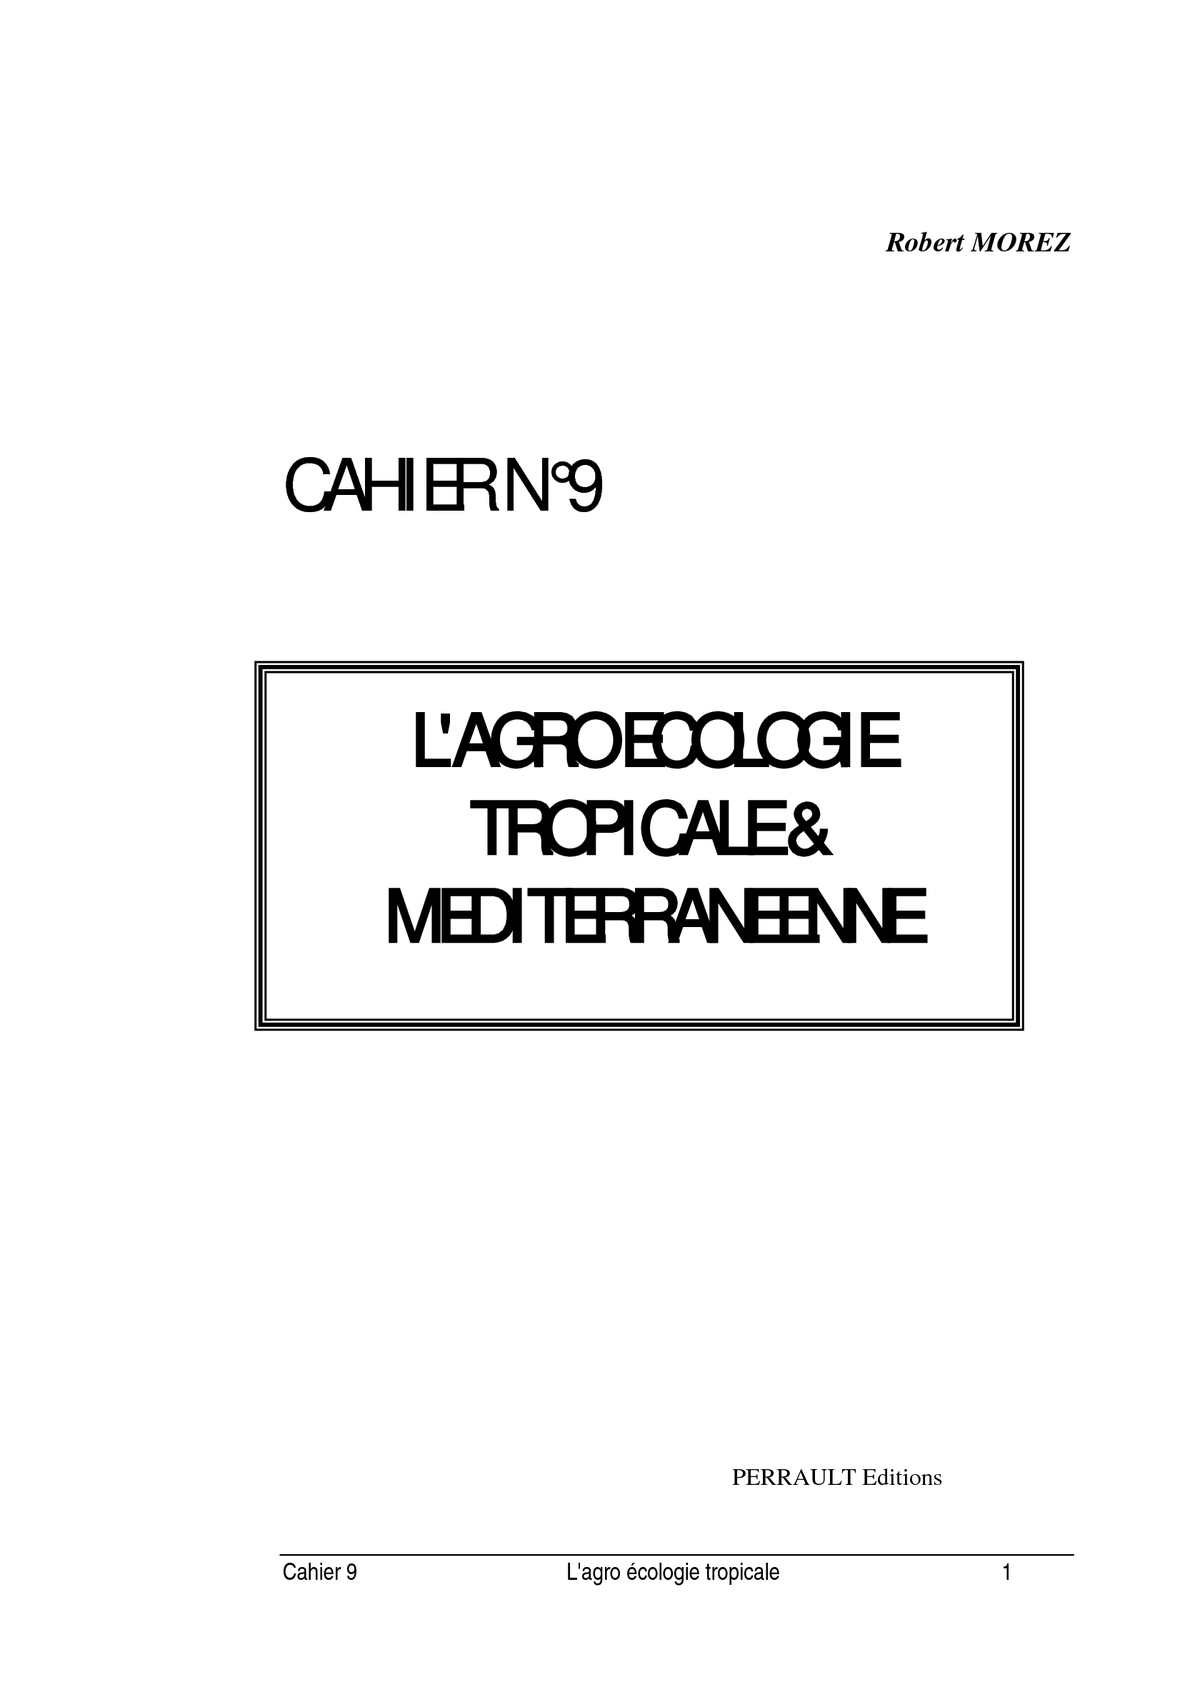 99b2c60a4ad4 Calaméo - Agroécologie tropicale et méditerranéenne